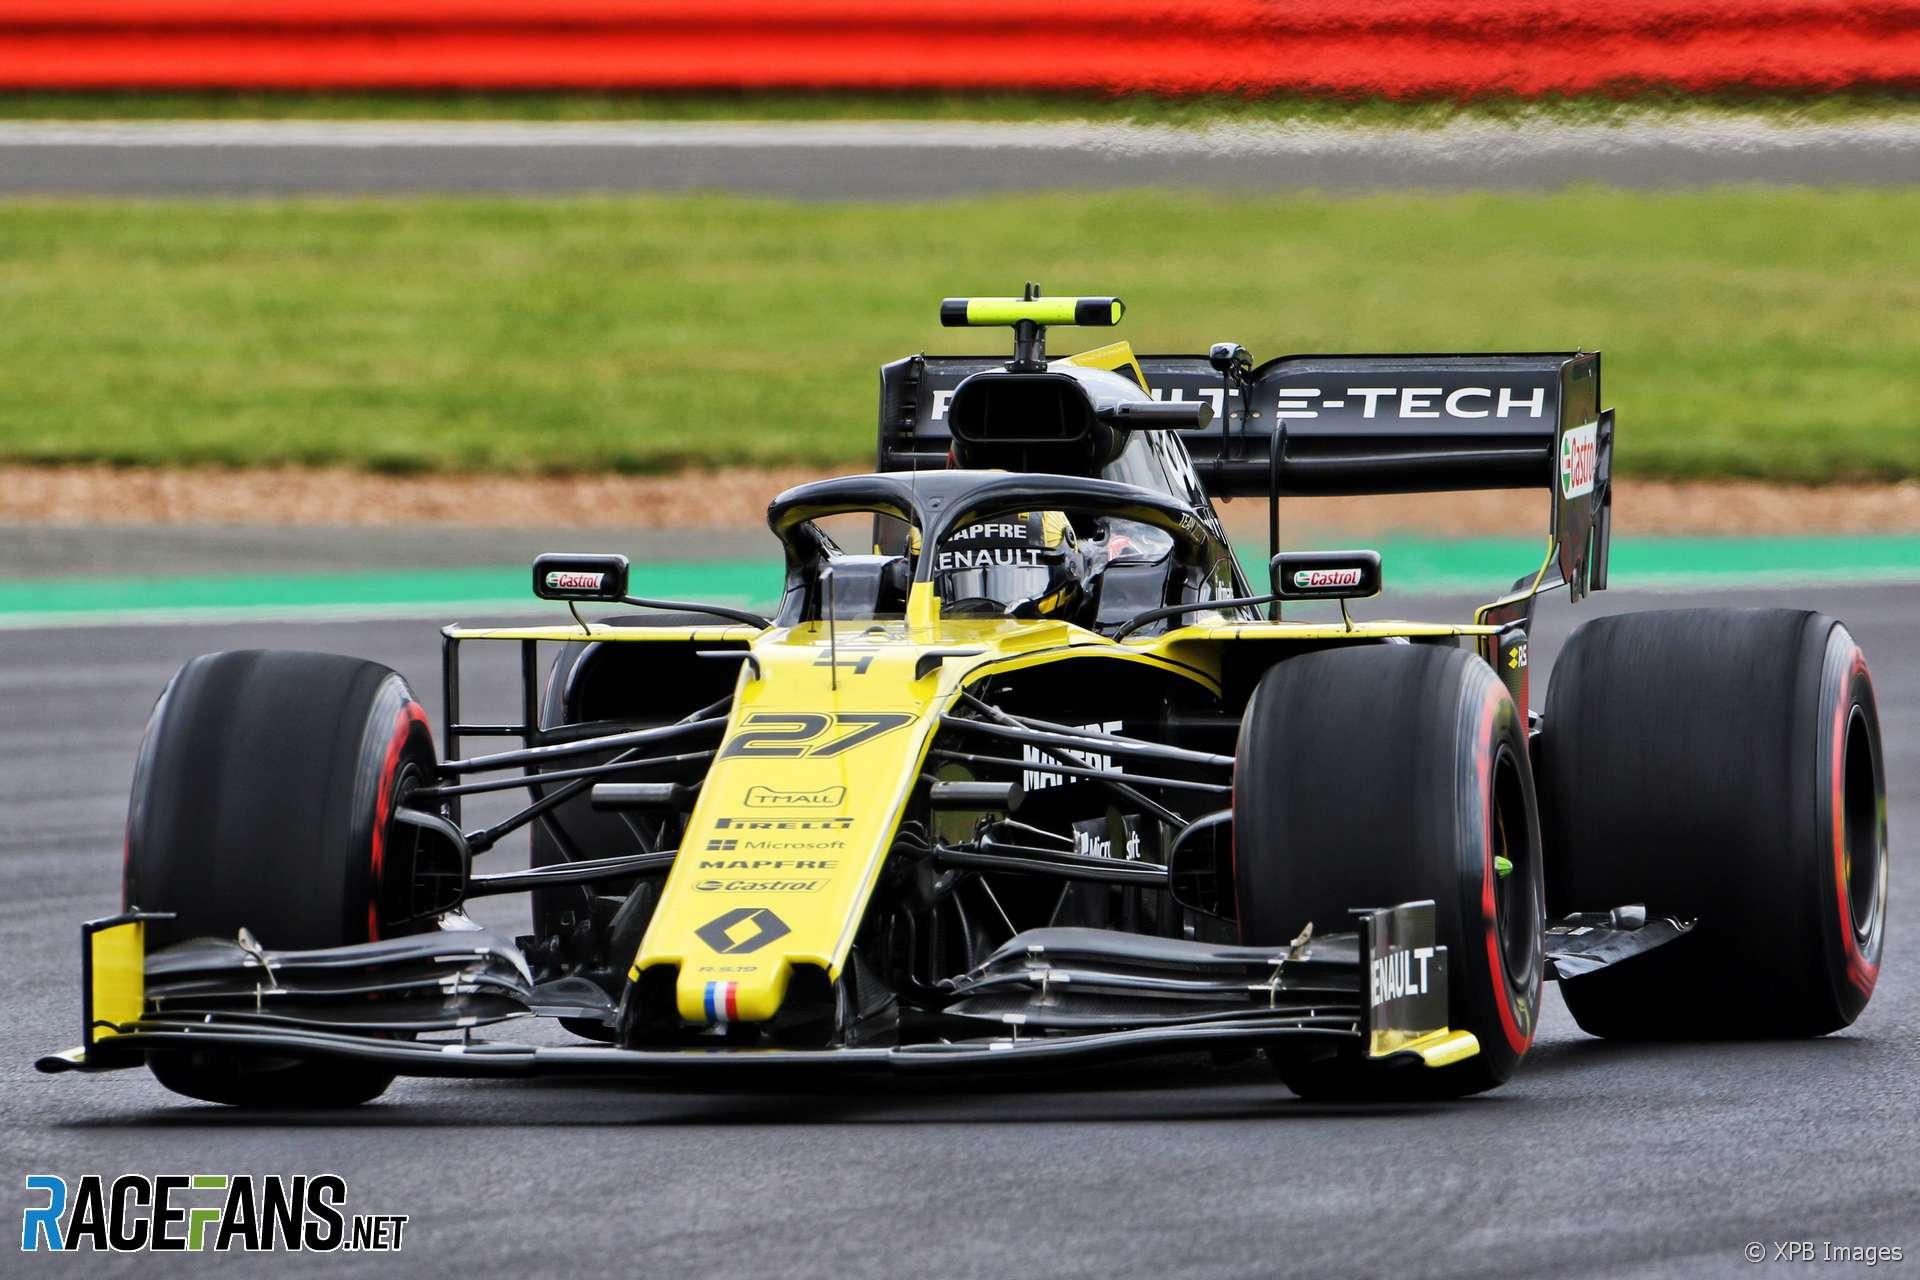 Nico Hulkenberg, Renault, Silverstone, 2019